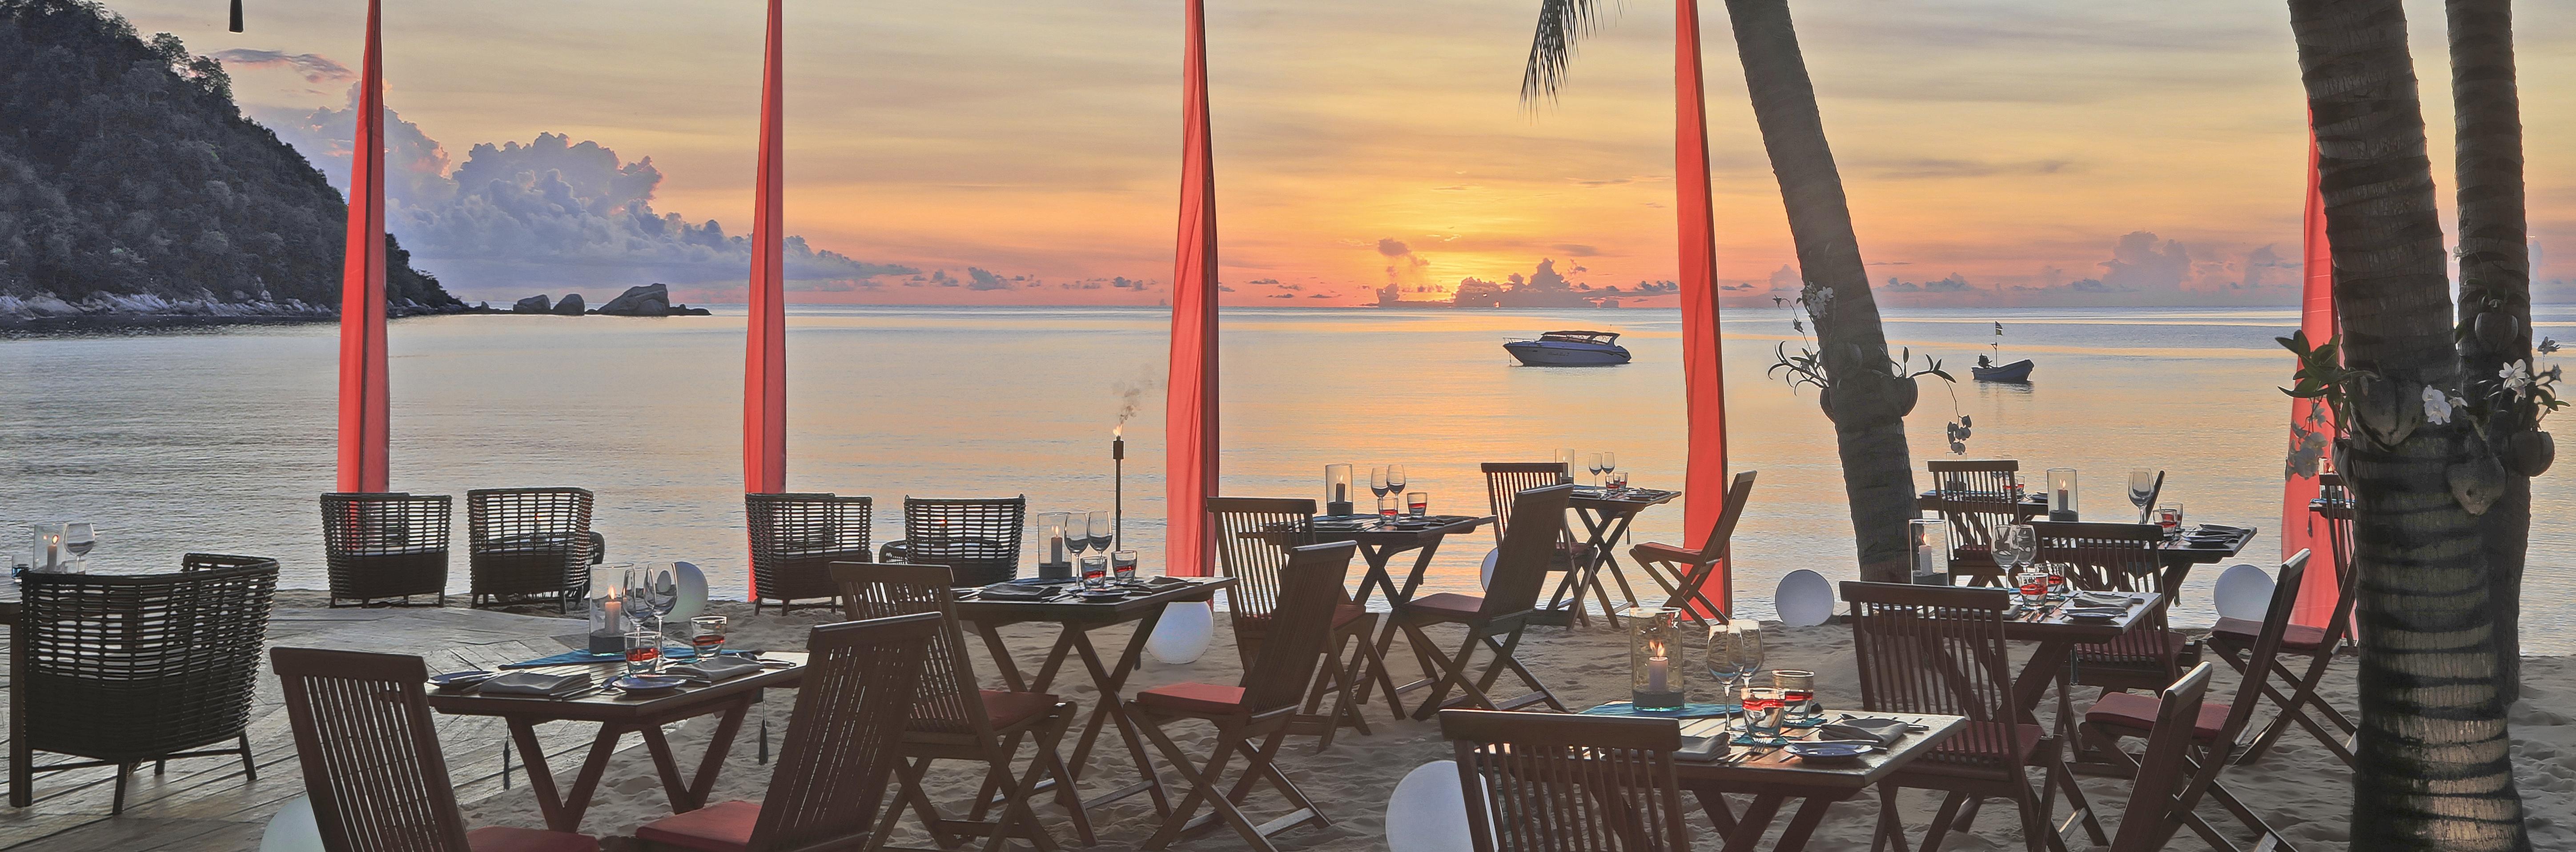 anantara-rasananda-beach-bistro